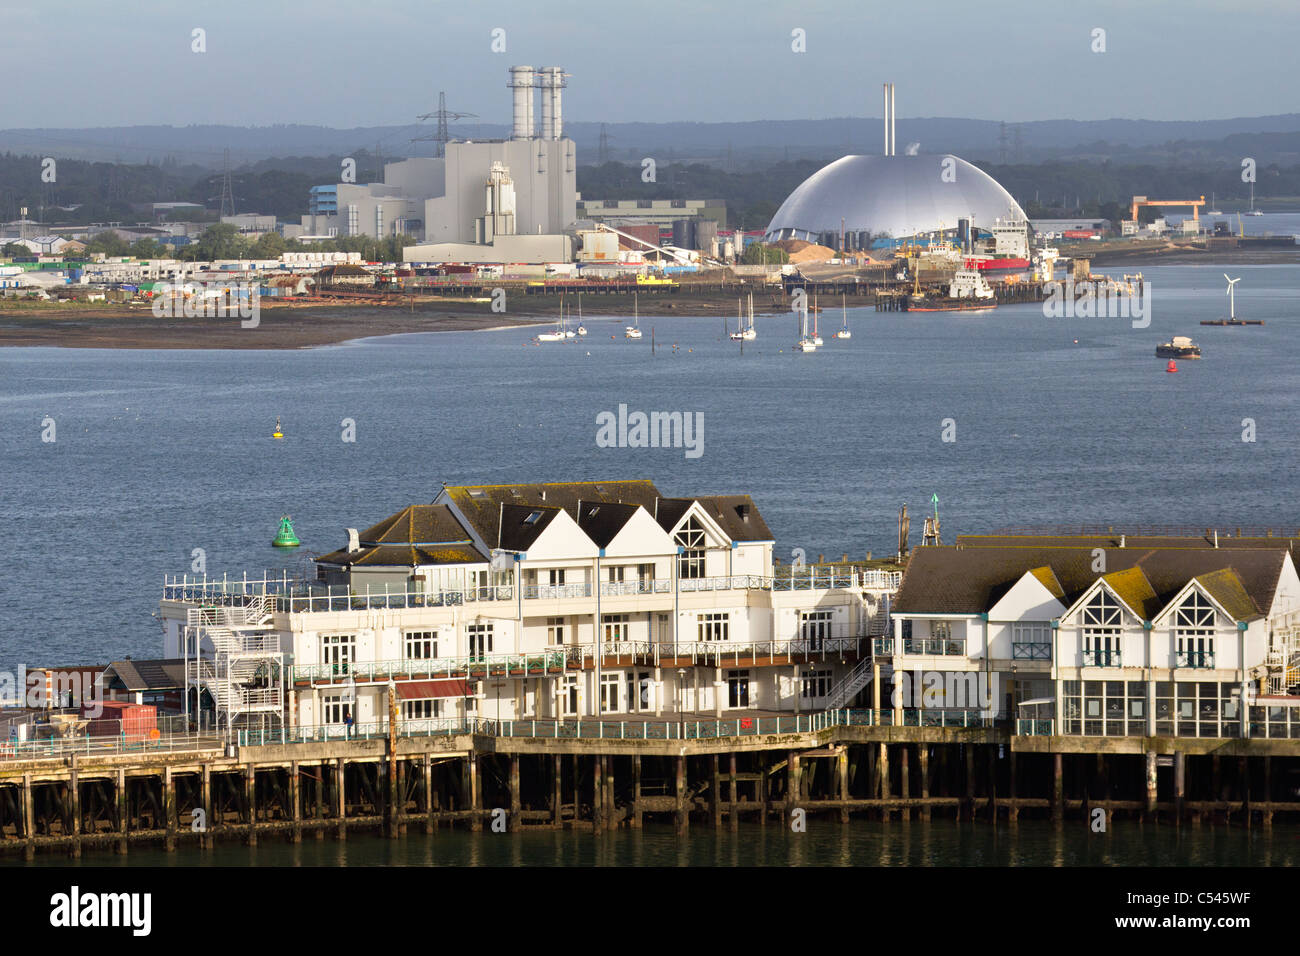 Old and new, Southampton England - Stock Image